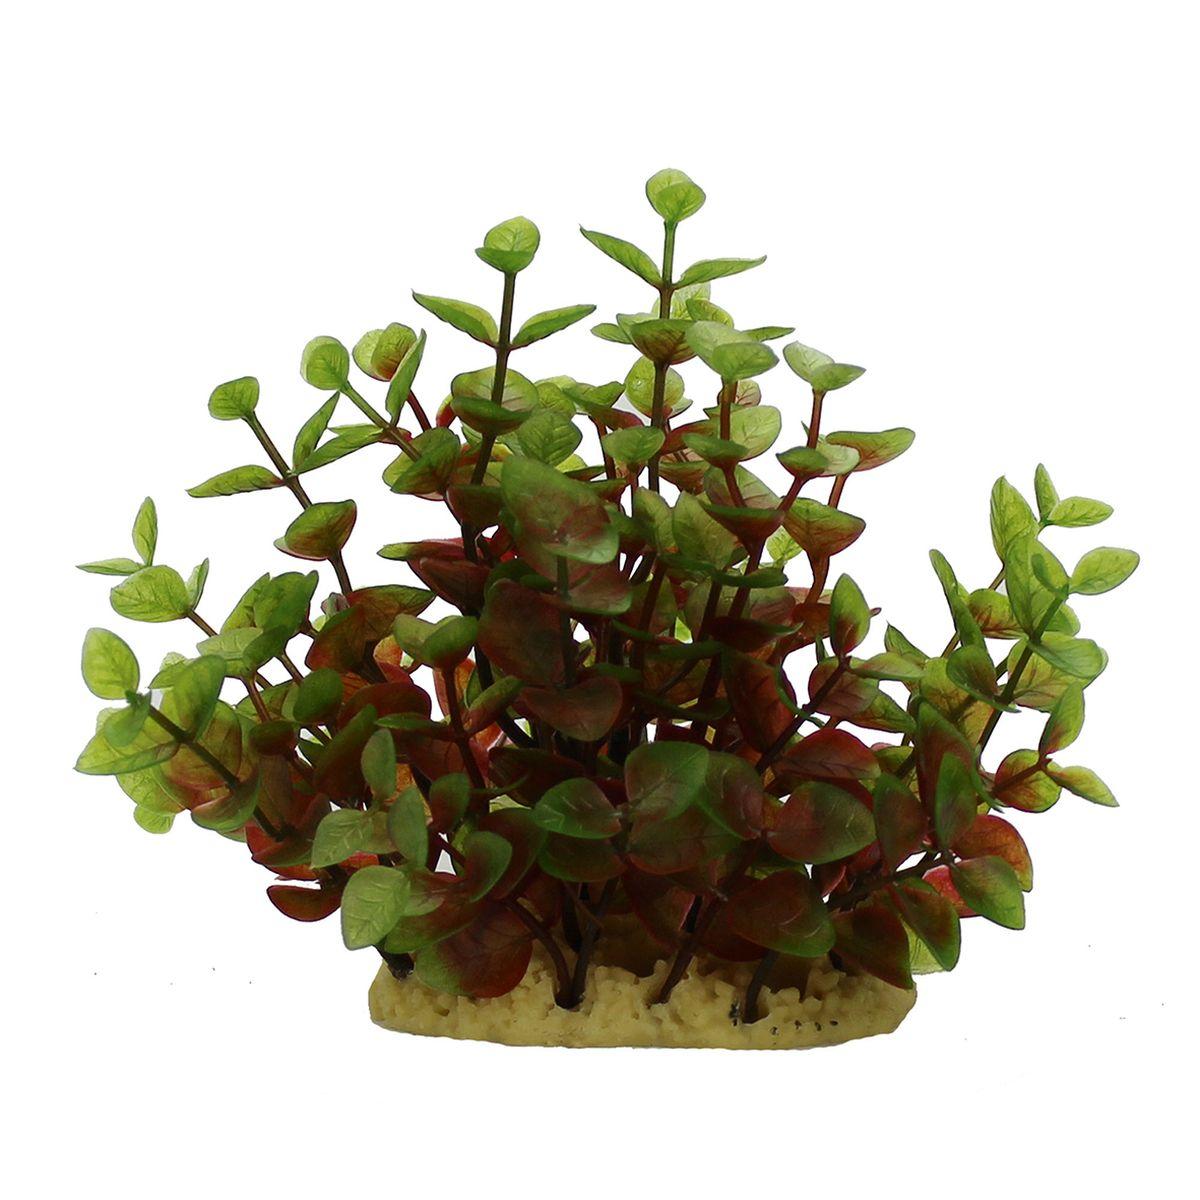 Растение для аквариума ArtUniq Людвигия красно-зеленая, высота 15 смART-1160114Растение для аквариума ArtUniq Людвигия красно-зеленая, высота 15 см